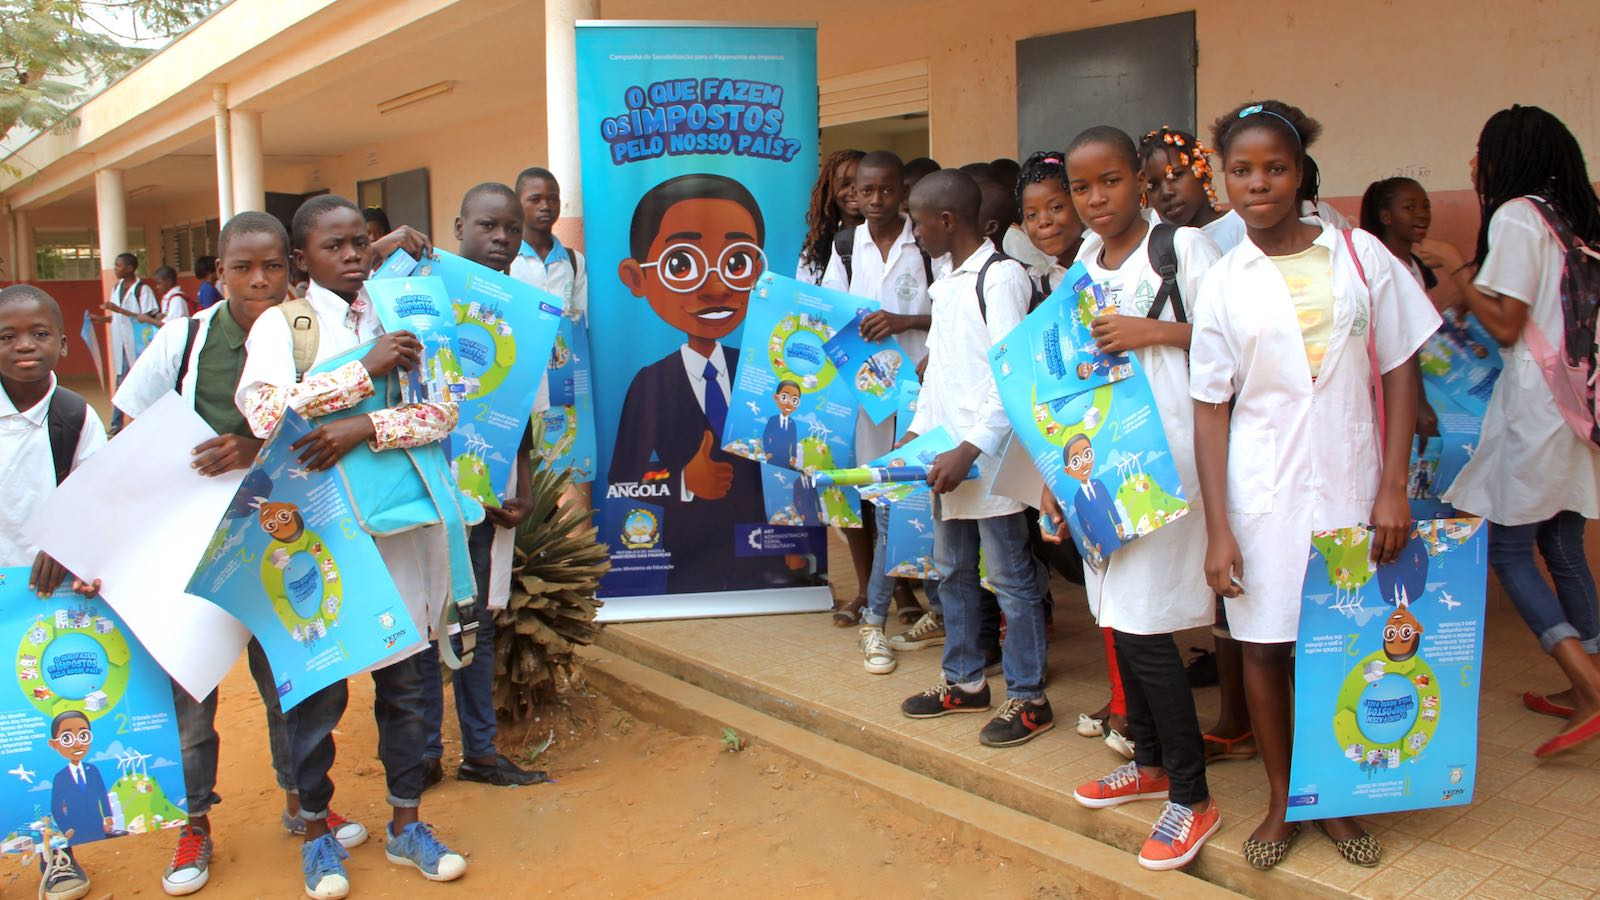 A campanha teve intensa actividade nas escolas do ensino fundamental